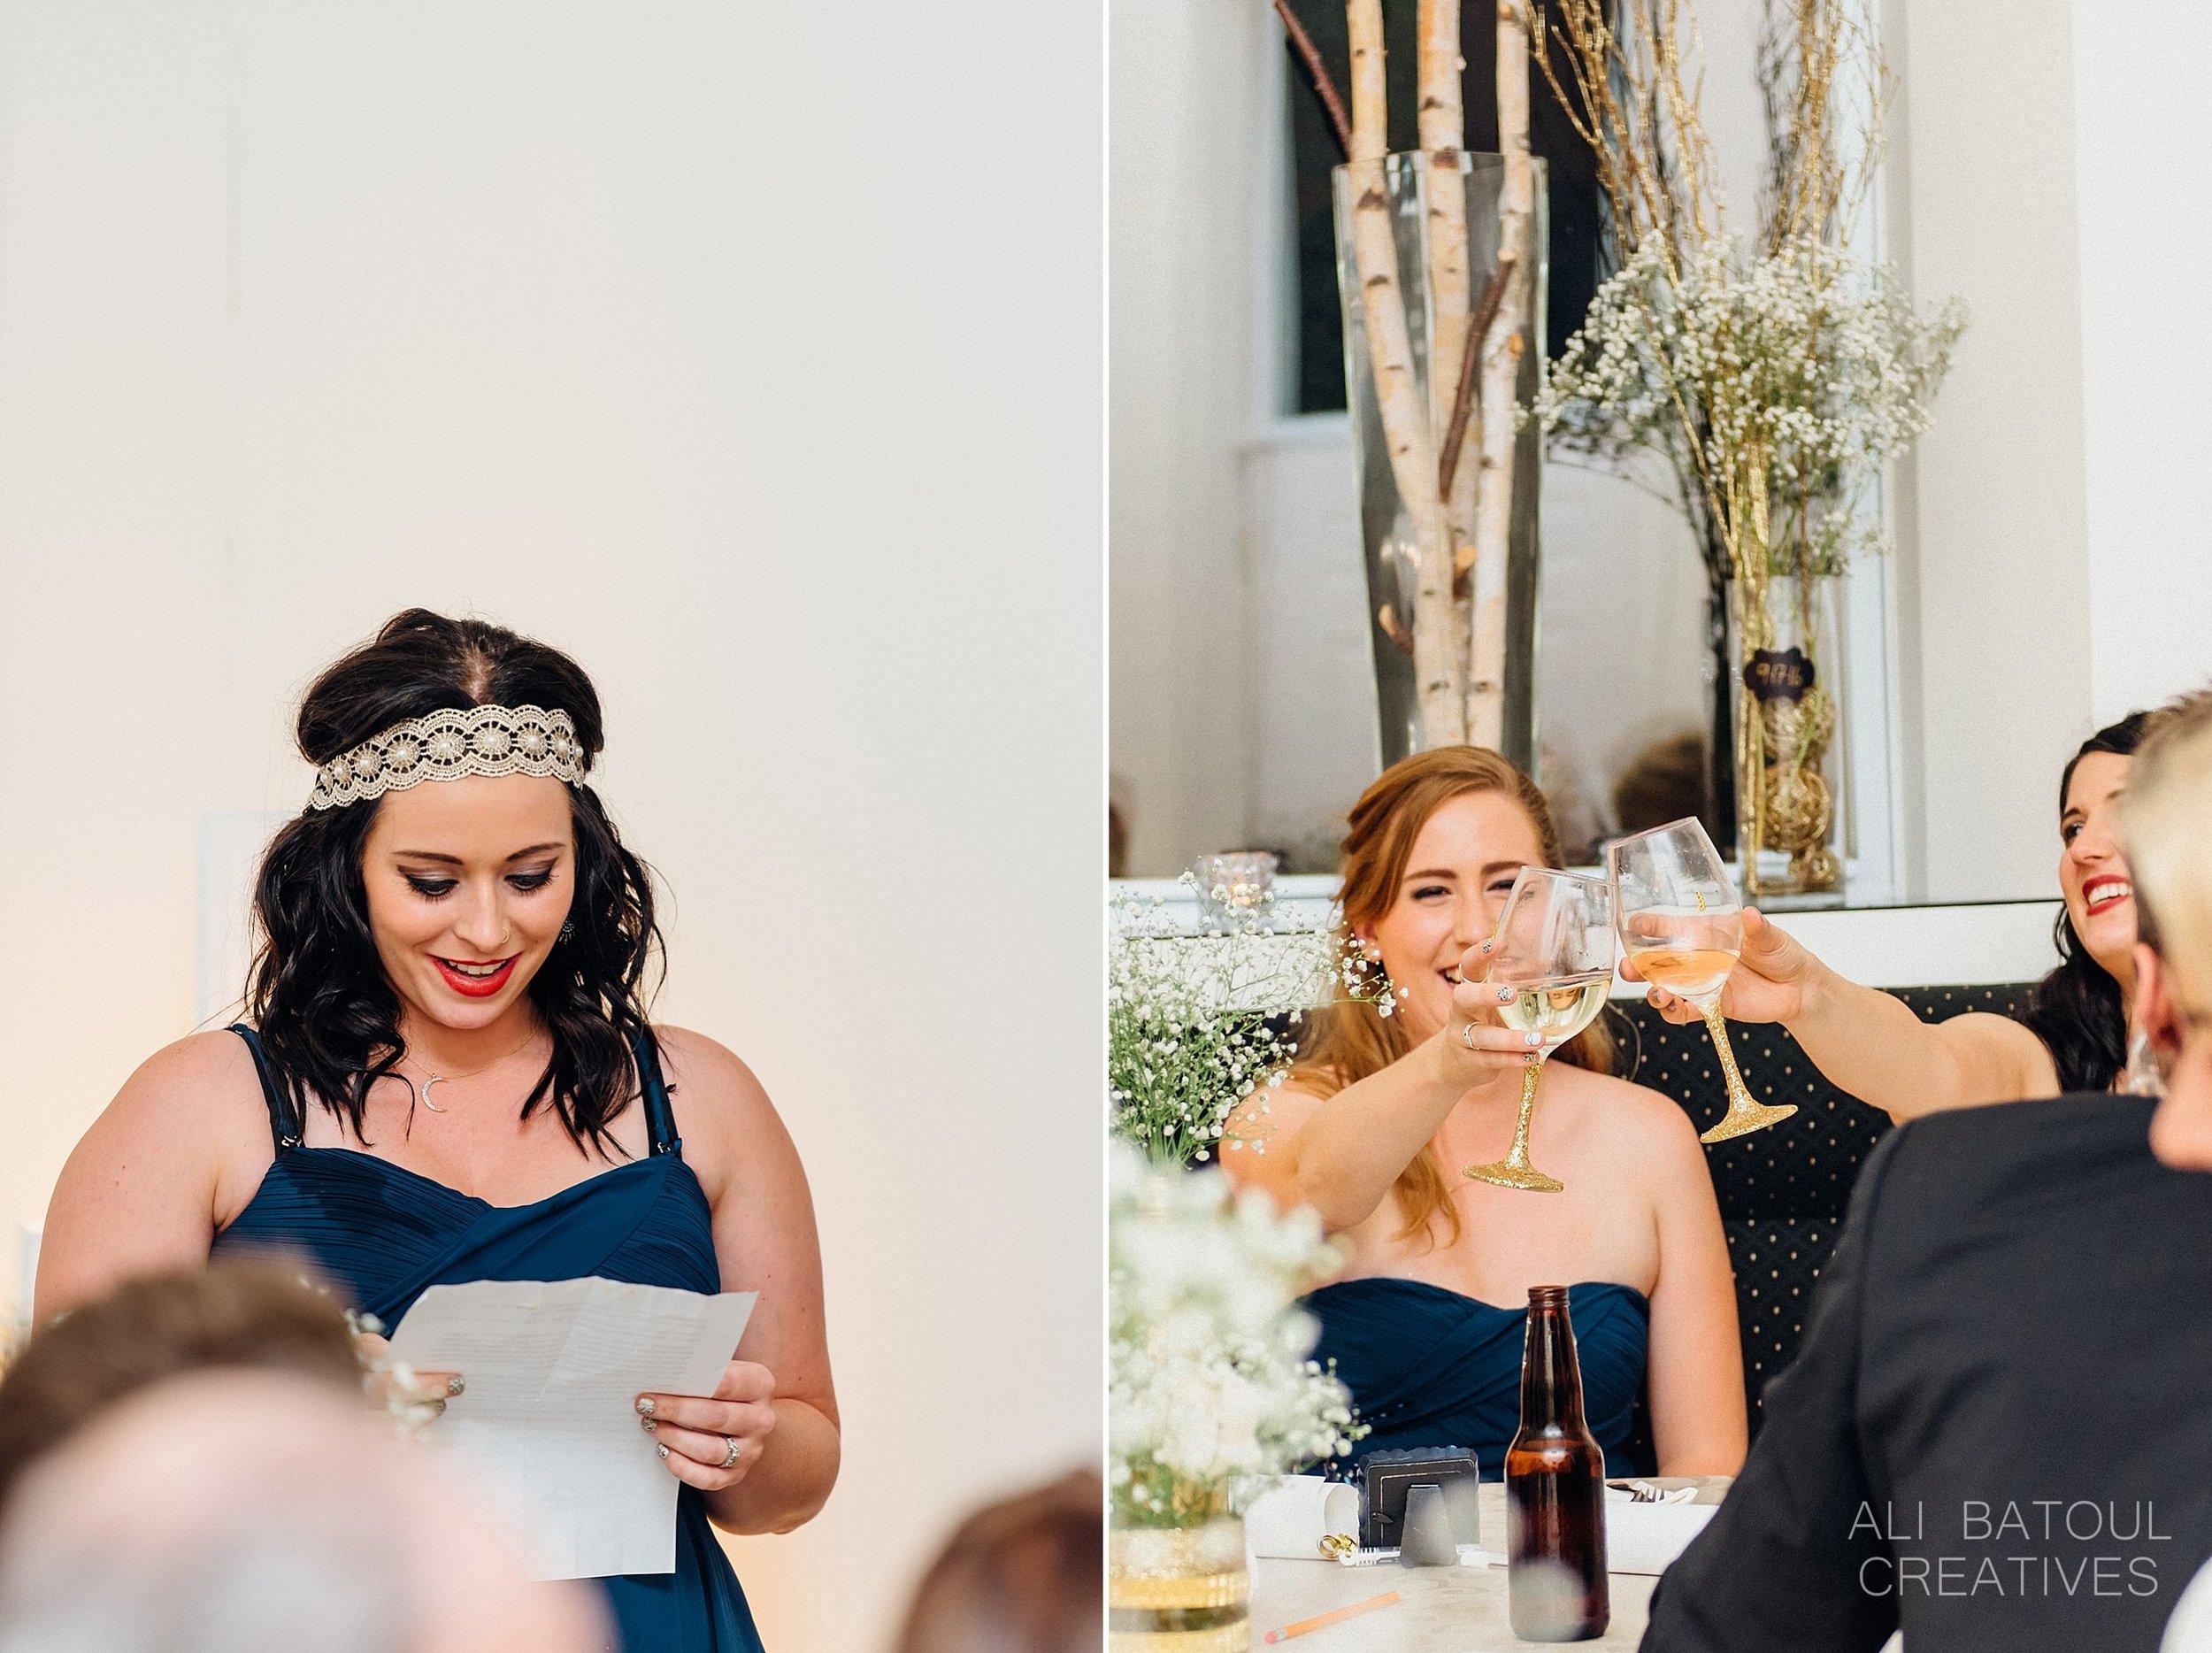 Jocelyn + Steve At The Schoolhouse Wedding - Ali and Batoul Fine Art Wedding Photography_0094.jpg